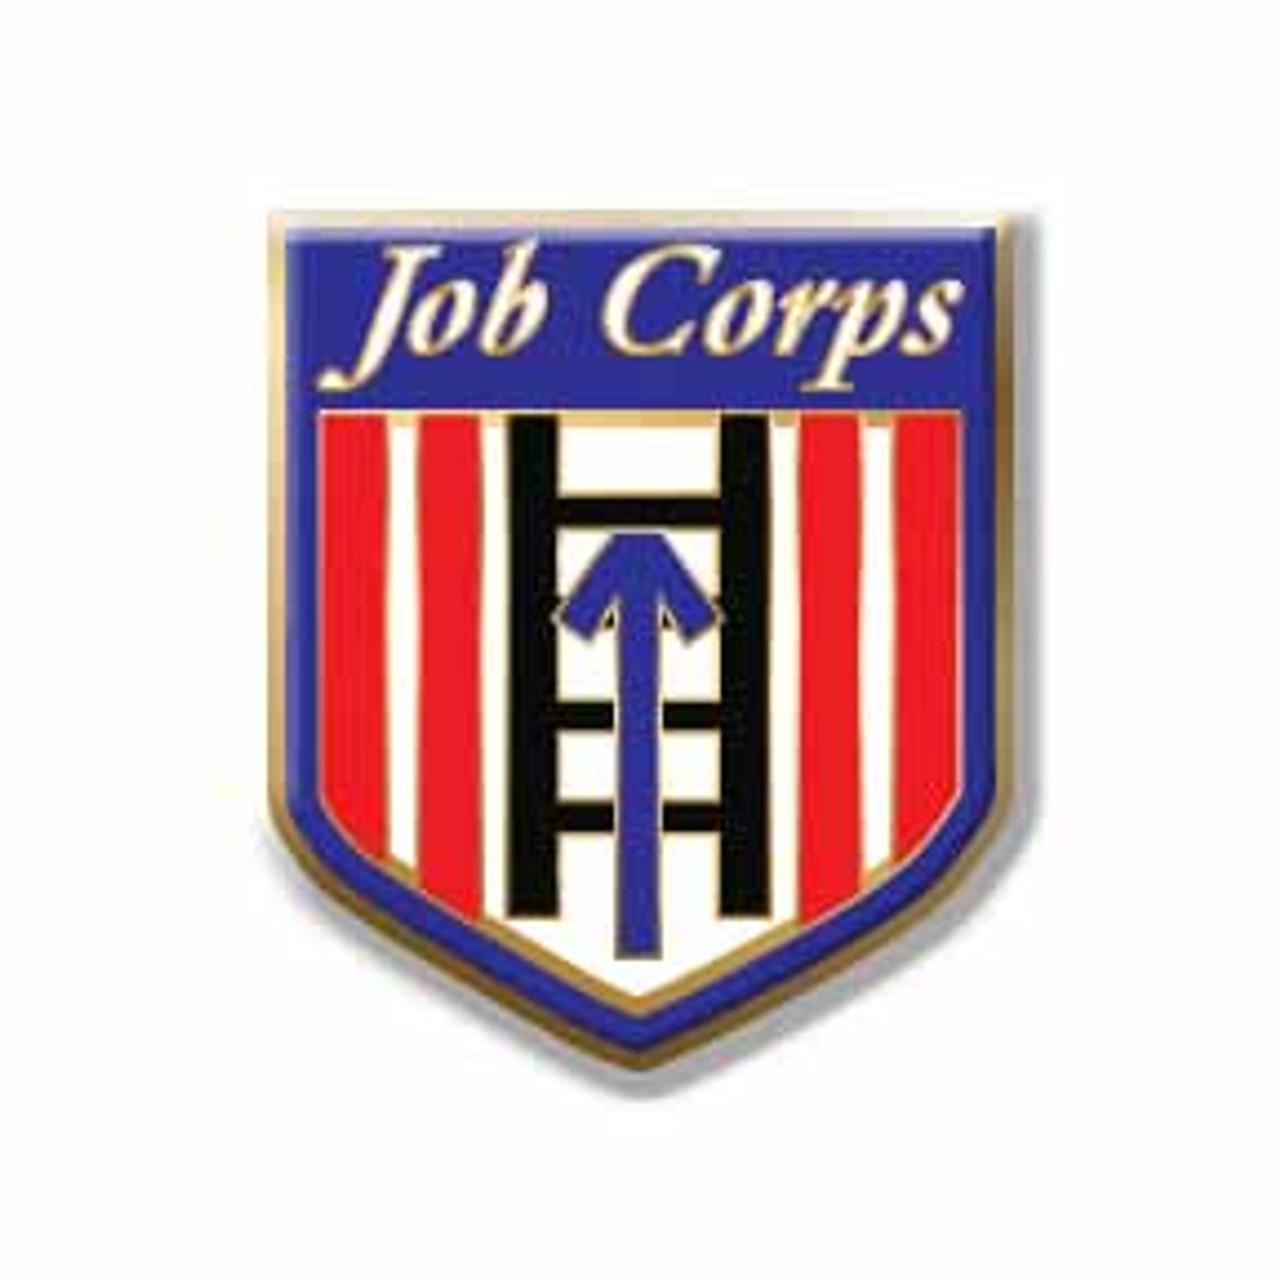 Job Corps Pin